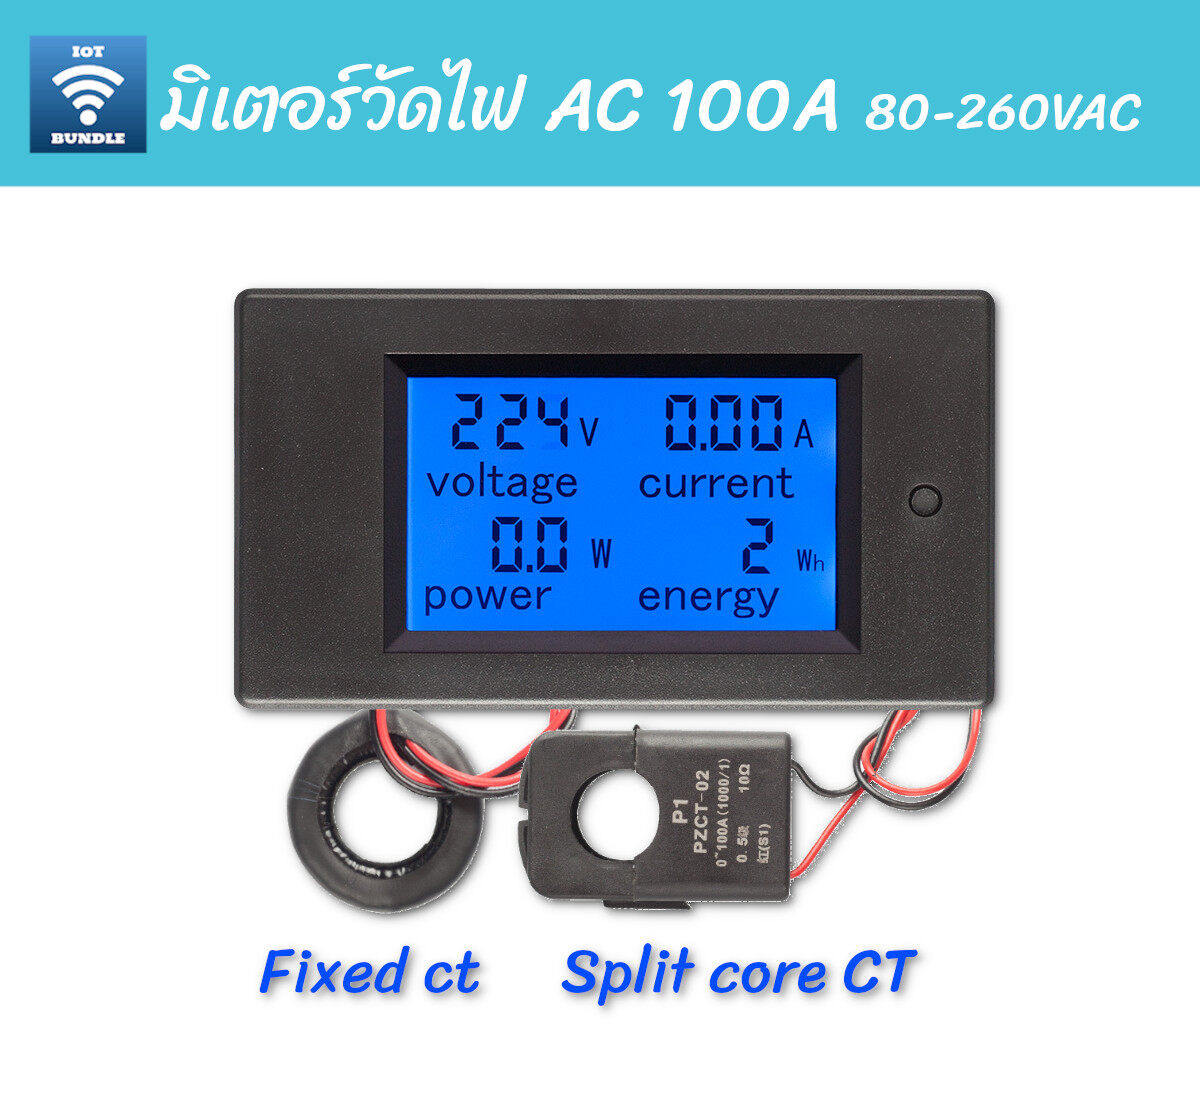 AC Power meter มิเตอร์วัดไฟกระแสสลับพร้อมแสดงผล 4 ค่า | PZEM 061 AC digital display multi-function power monitor